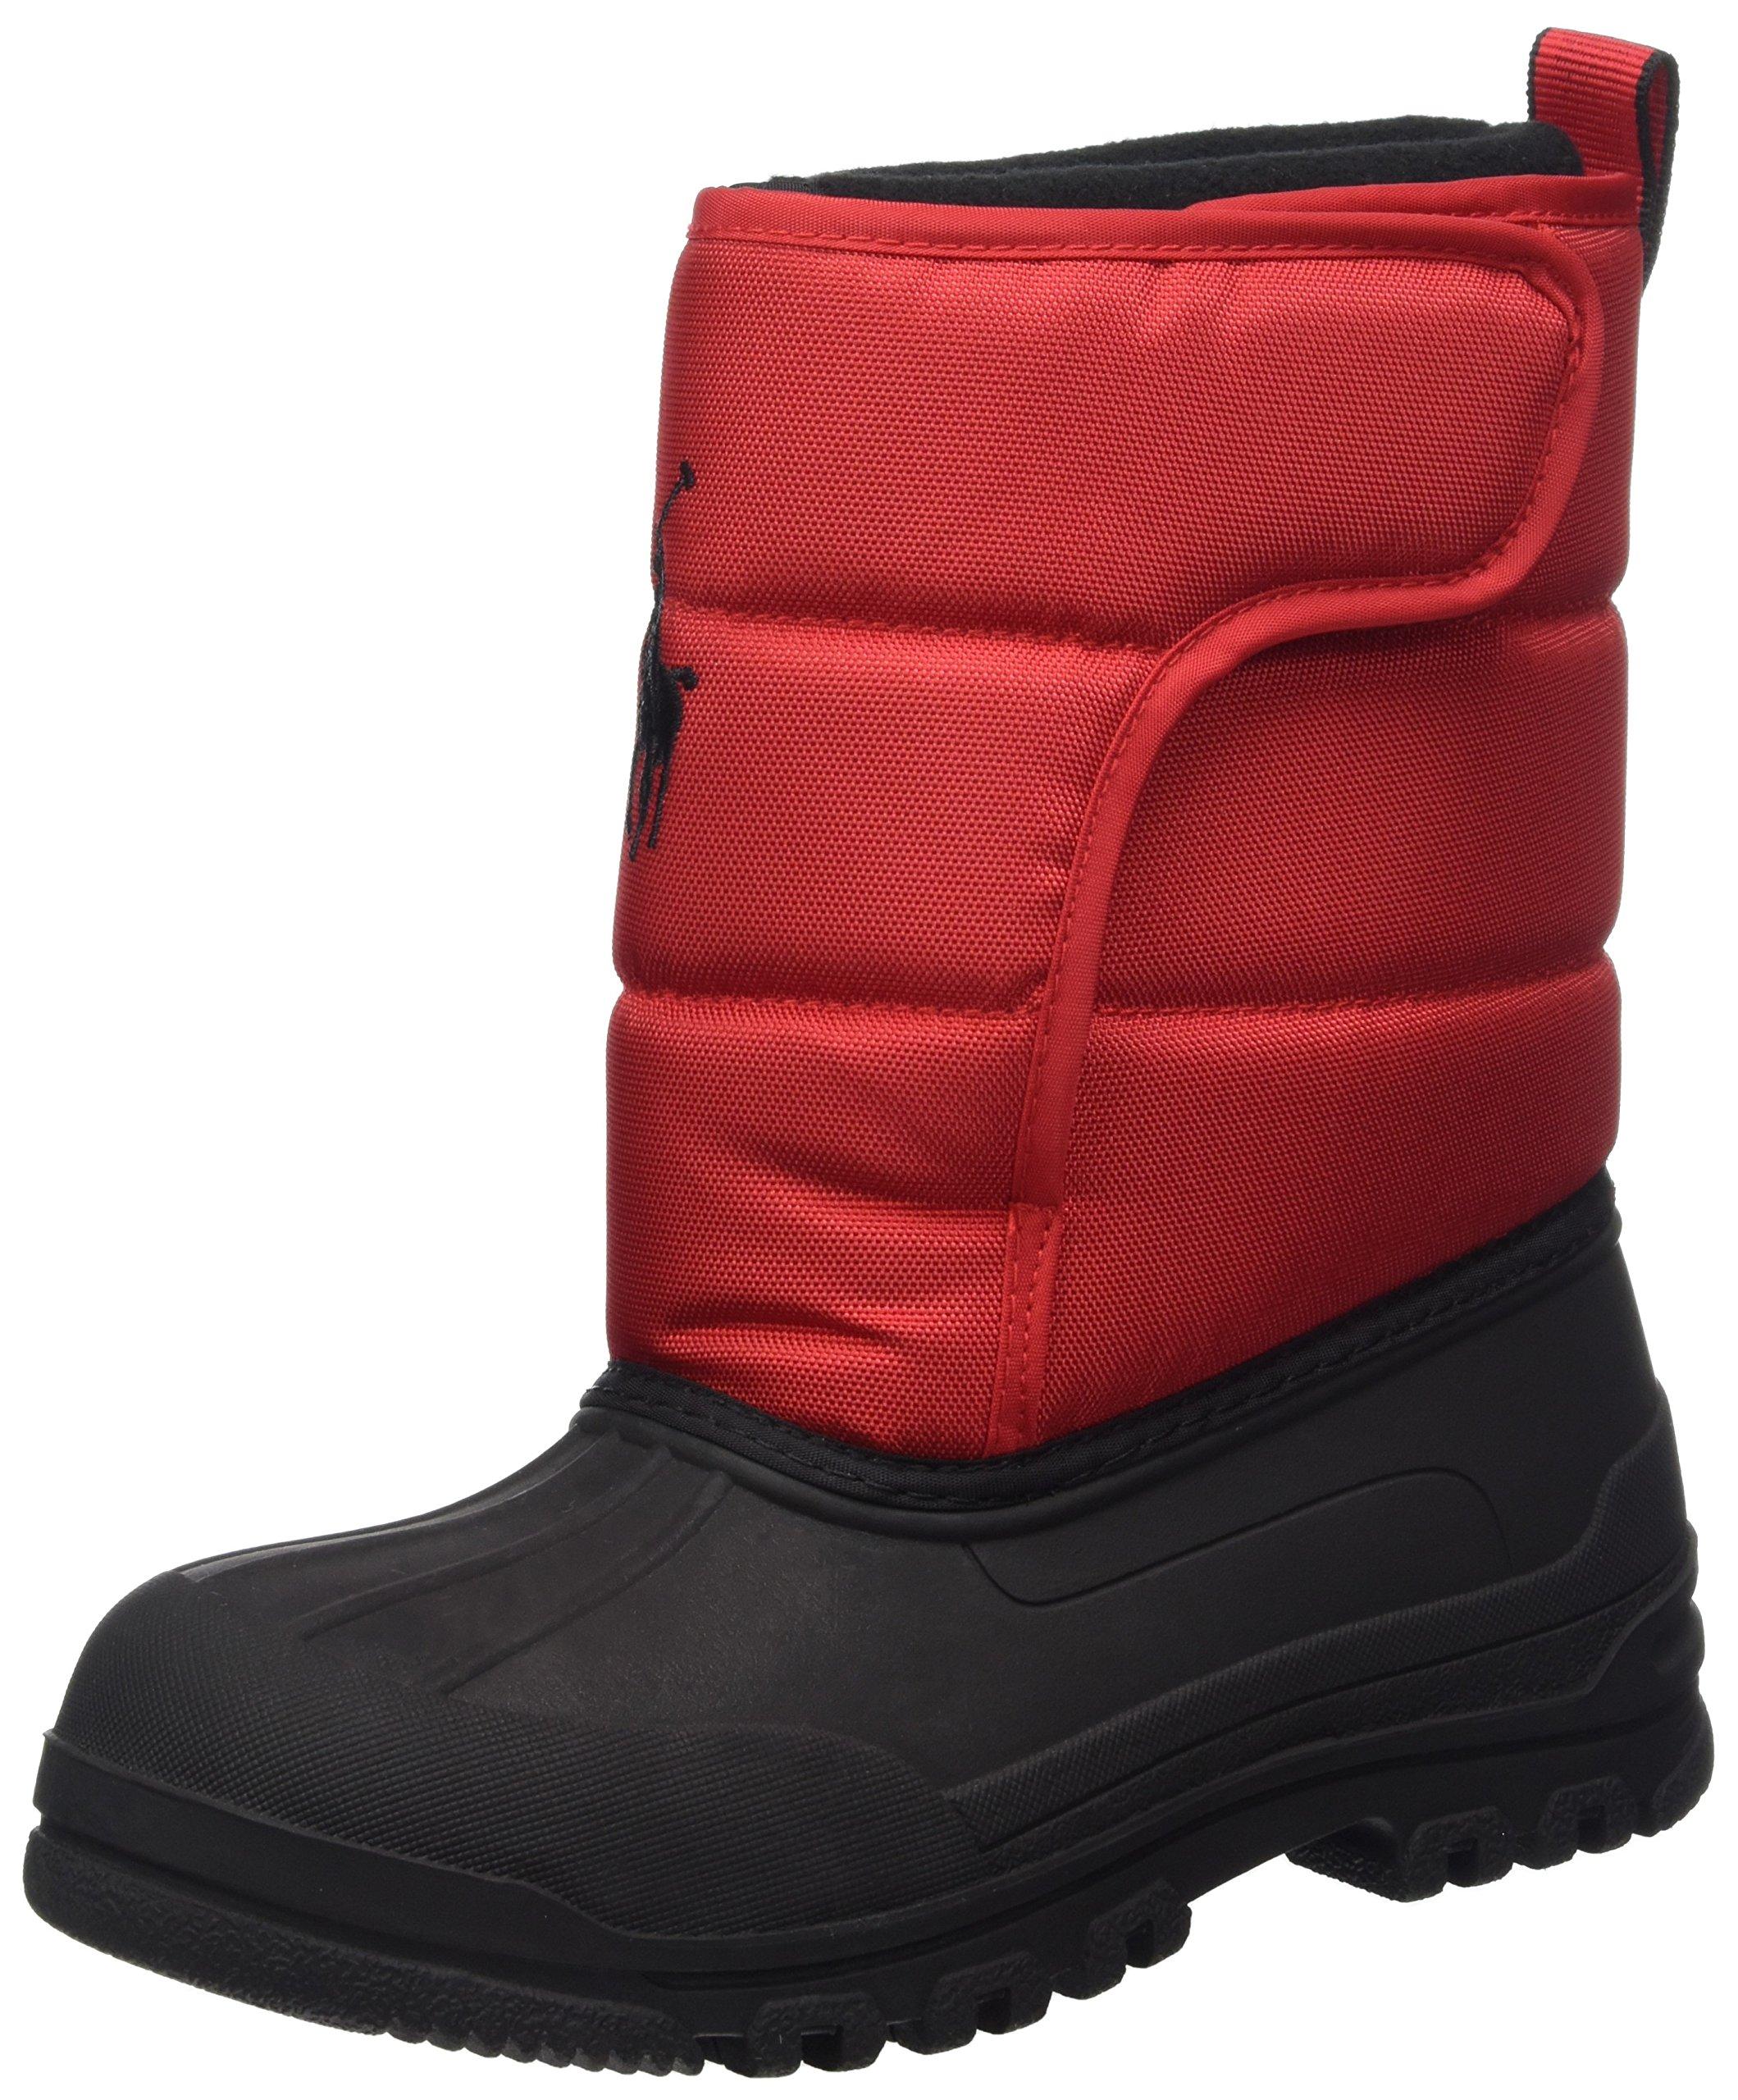 Polo Ralph Lauren Kids 993533 Snow Boot Red 4 M US Big Kid